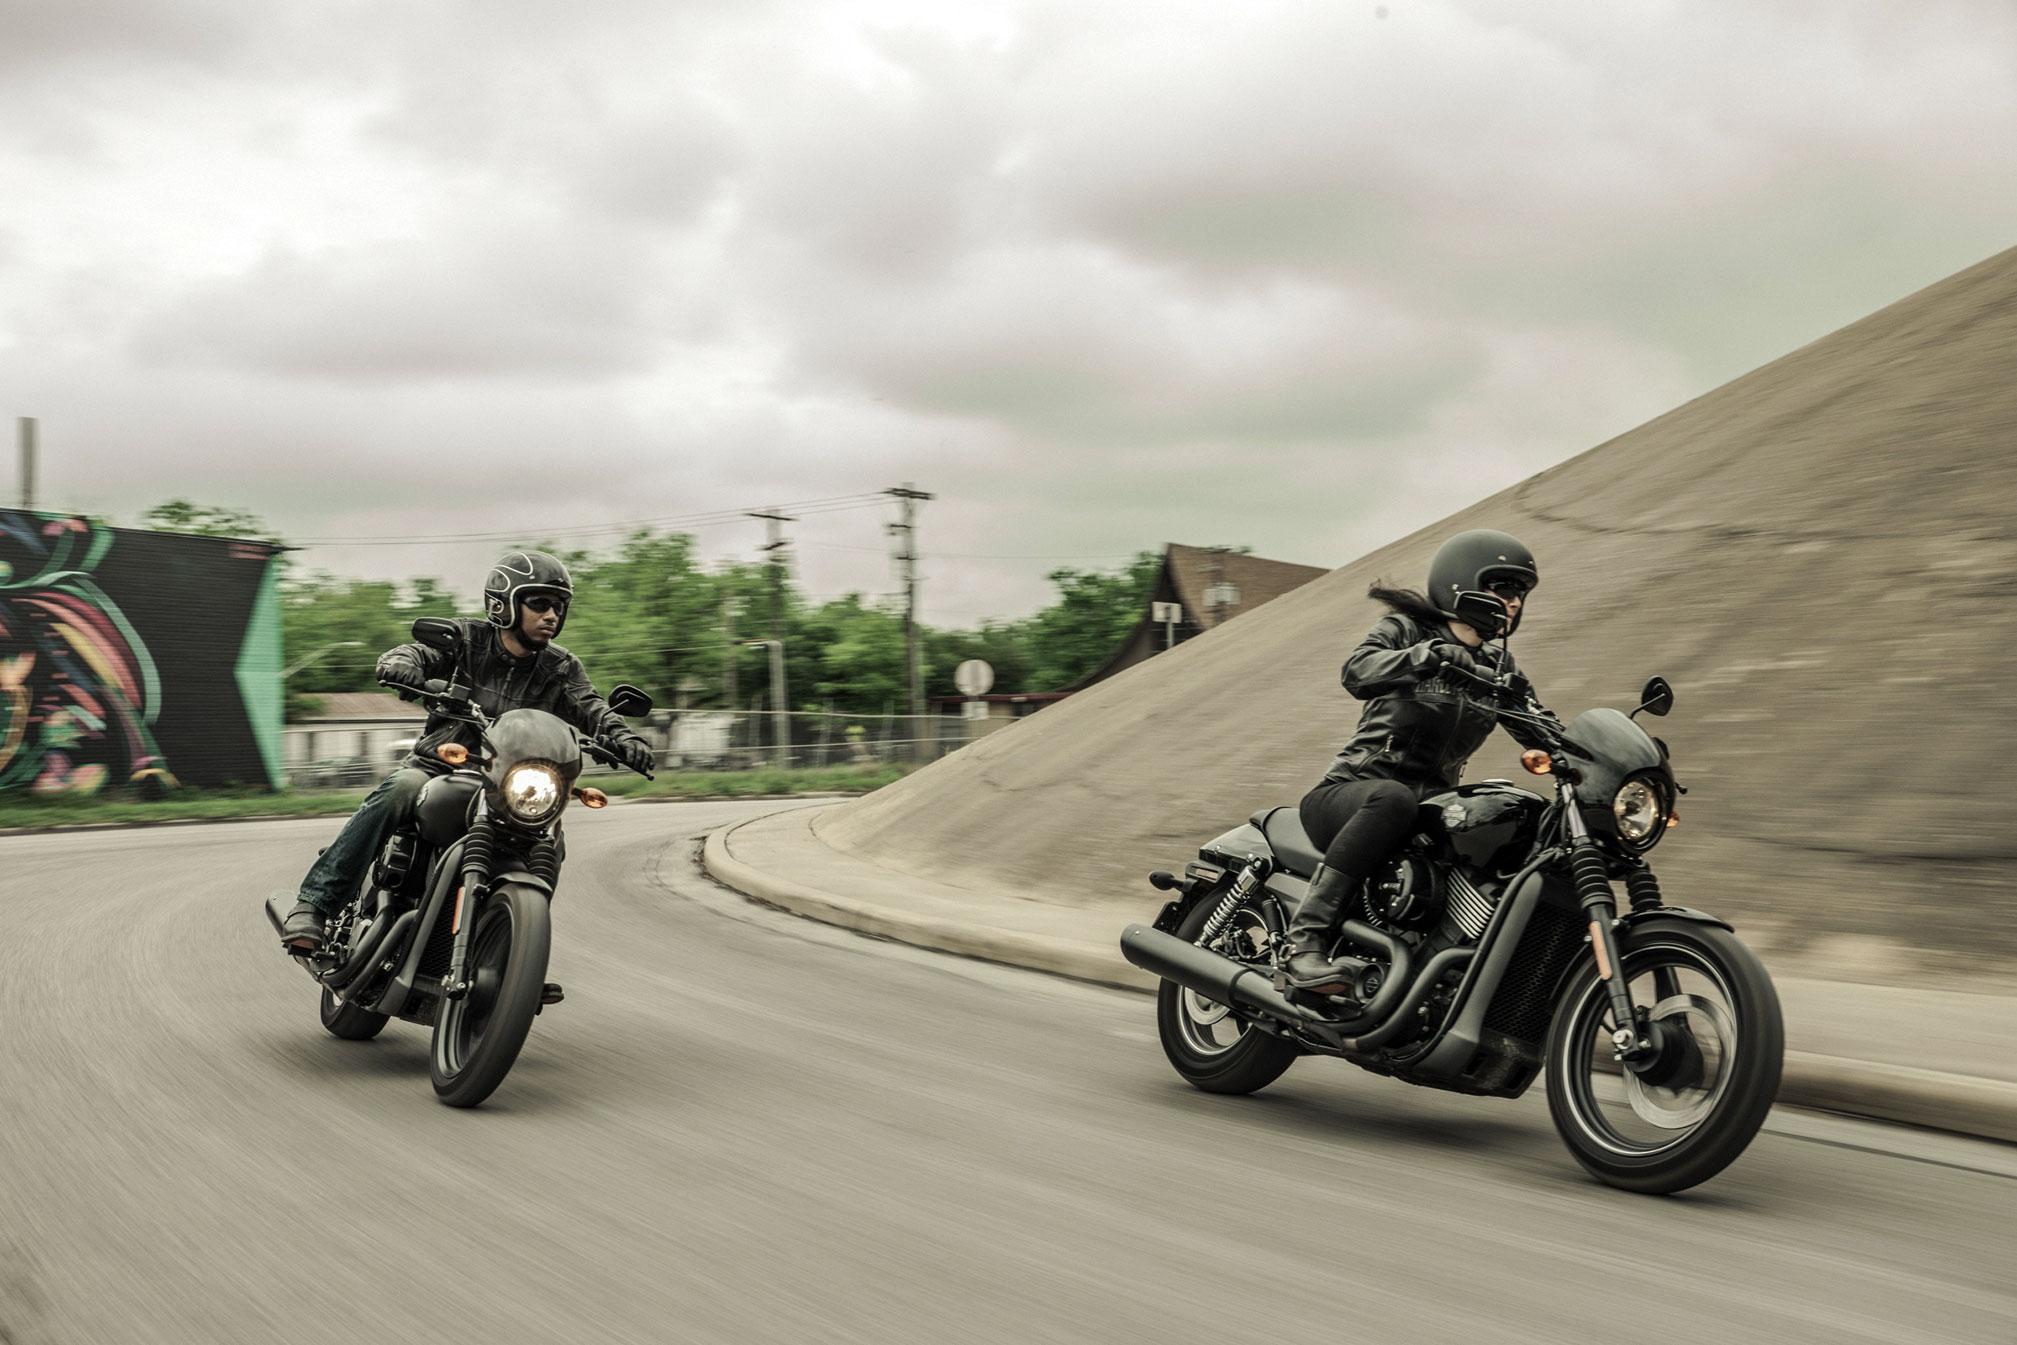 2017 Harley-davidson Street - 2017 Harley Davidson Street Rods , HD Wallpaper & Backgrounds